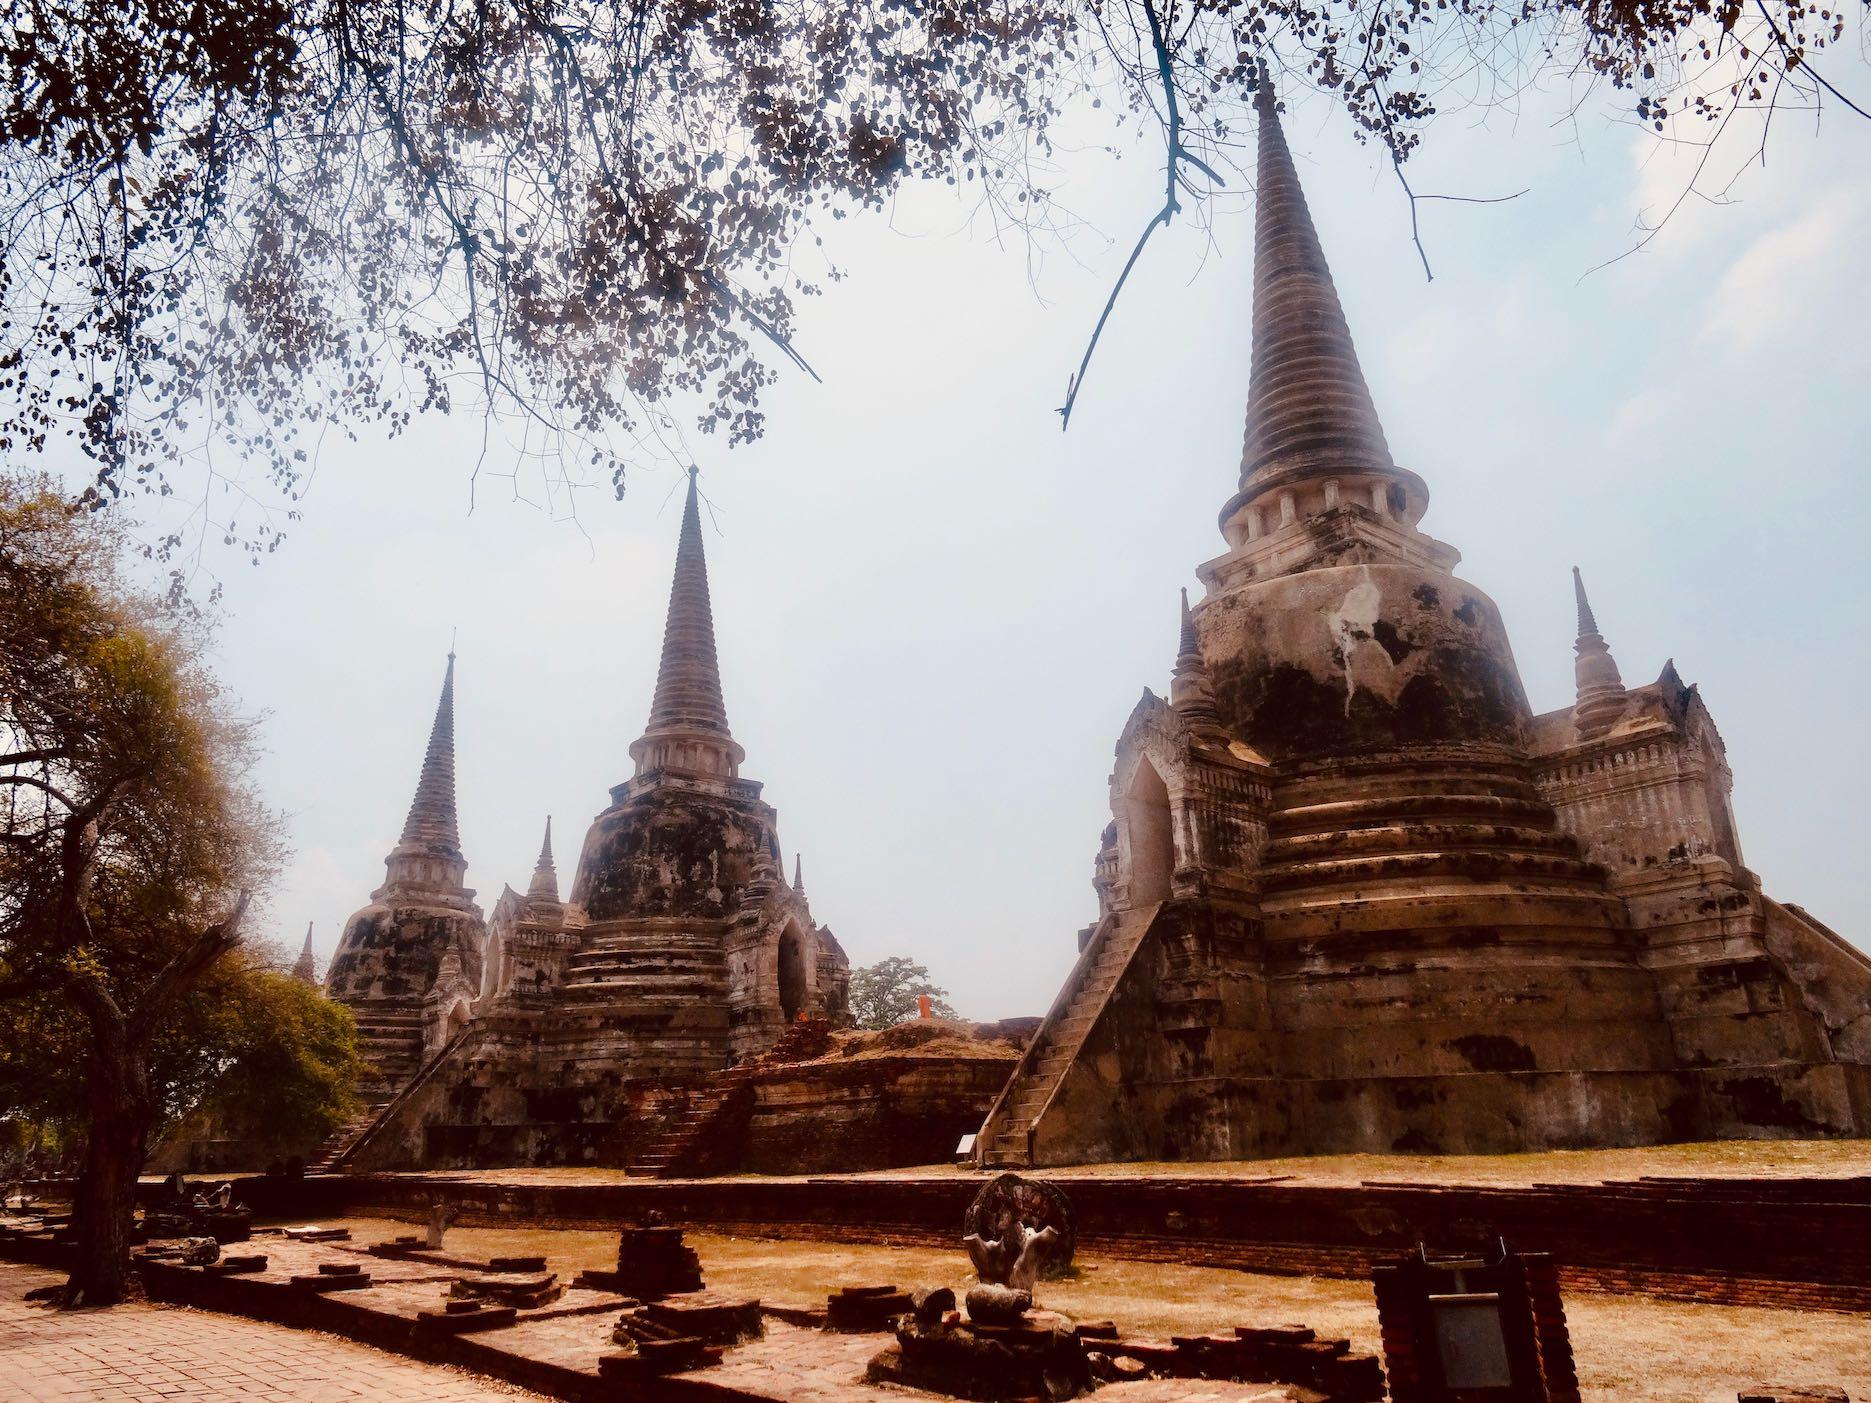 The three bell shaped stupas of Wat Phra Si Sanphet